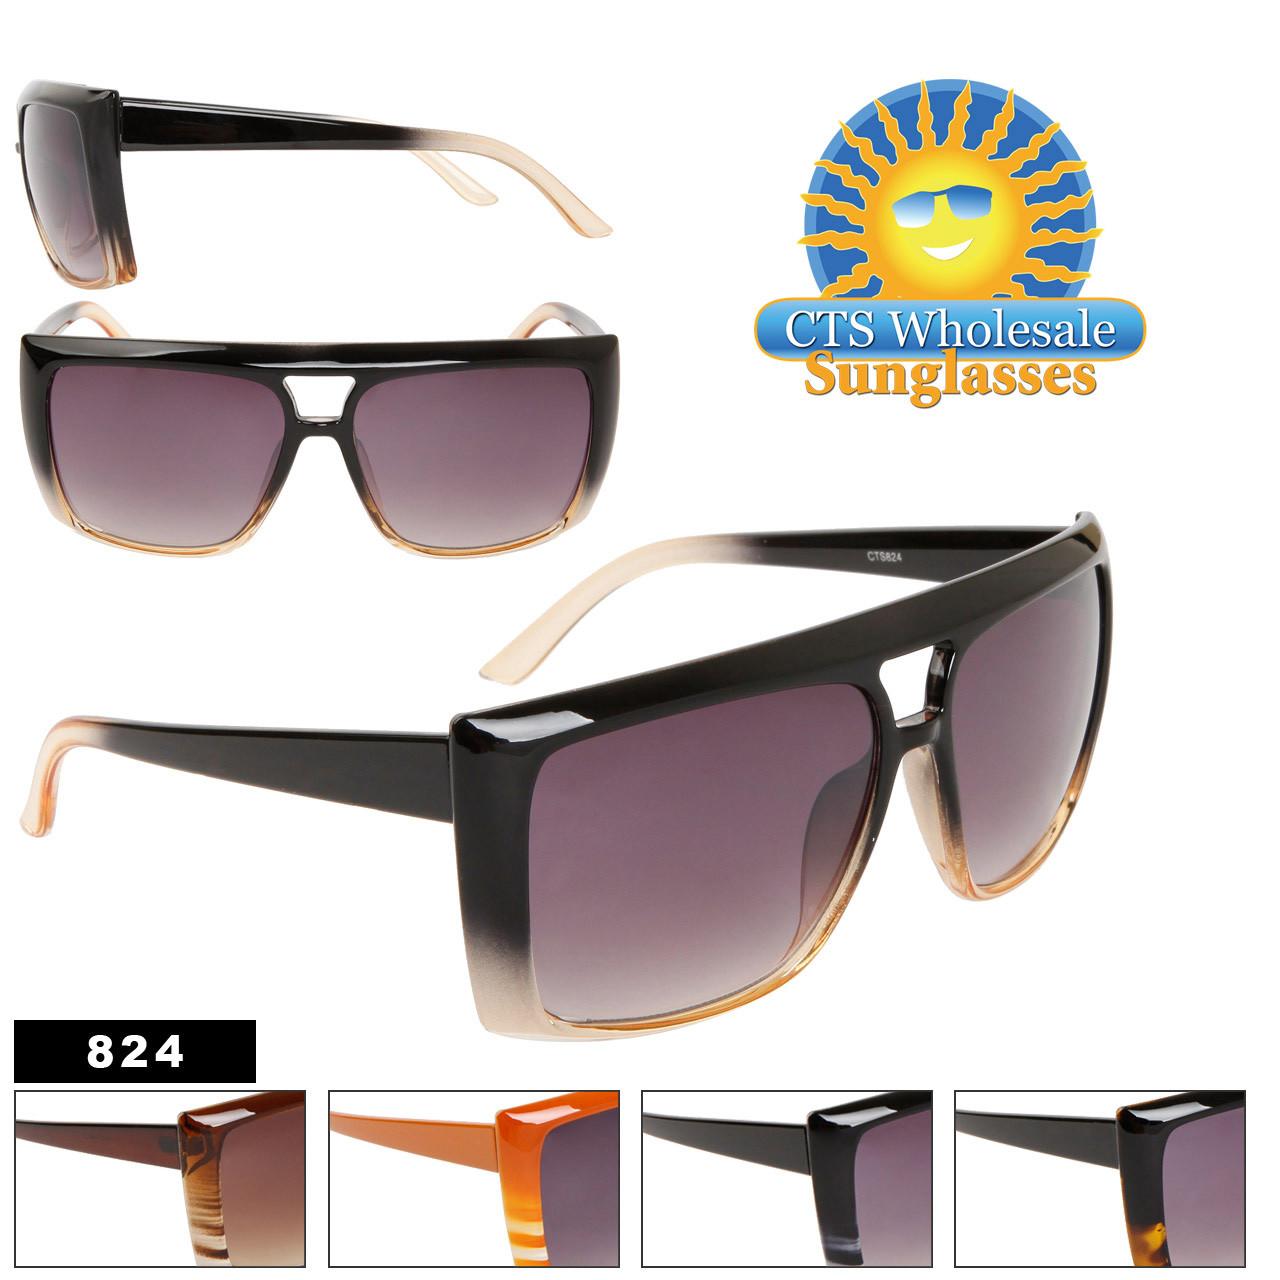 Wholesale Sunglasses 824